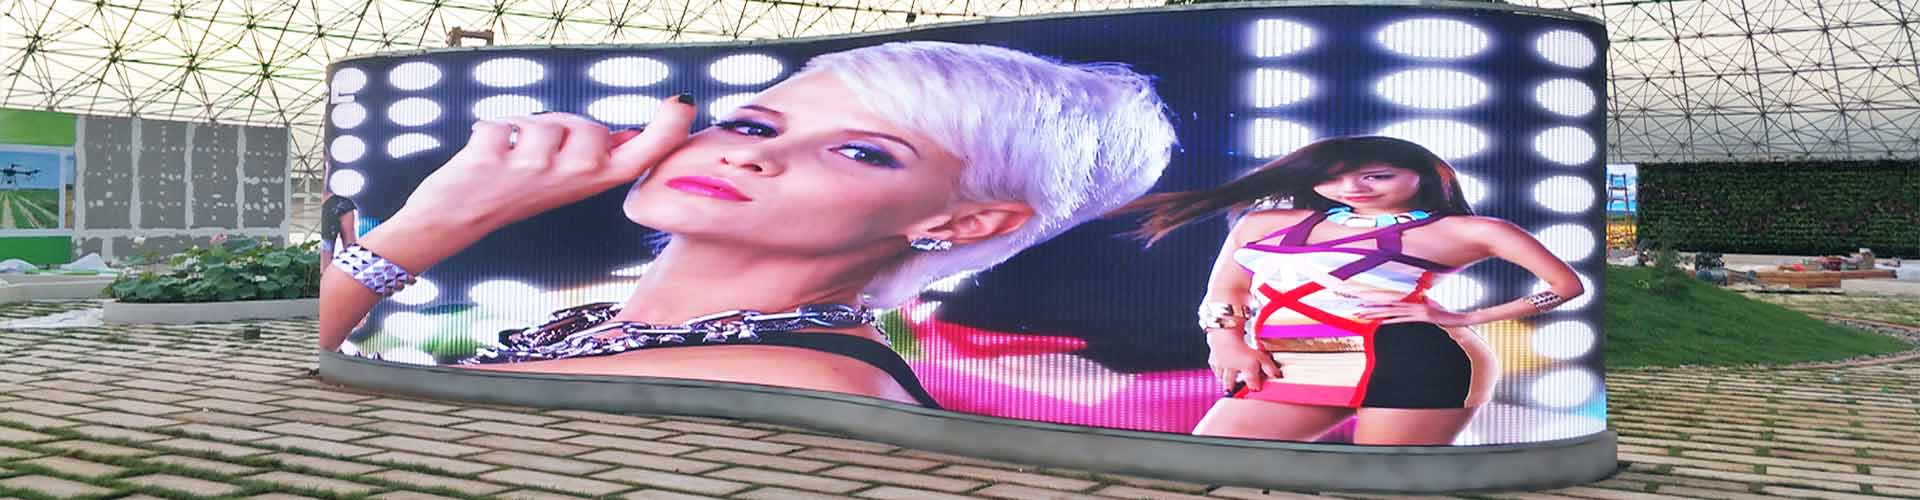 Flexible Video Display